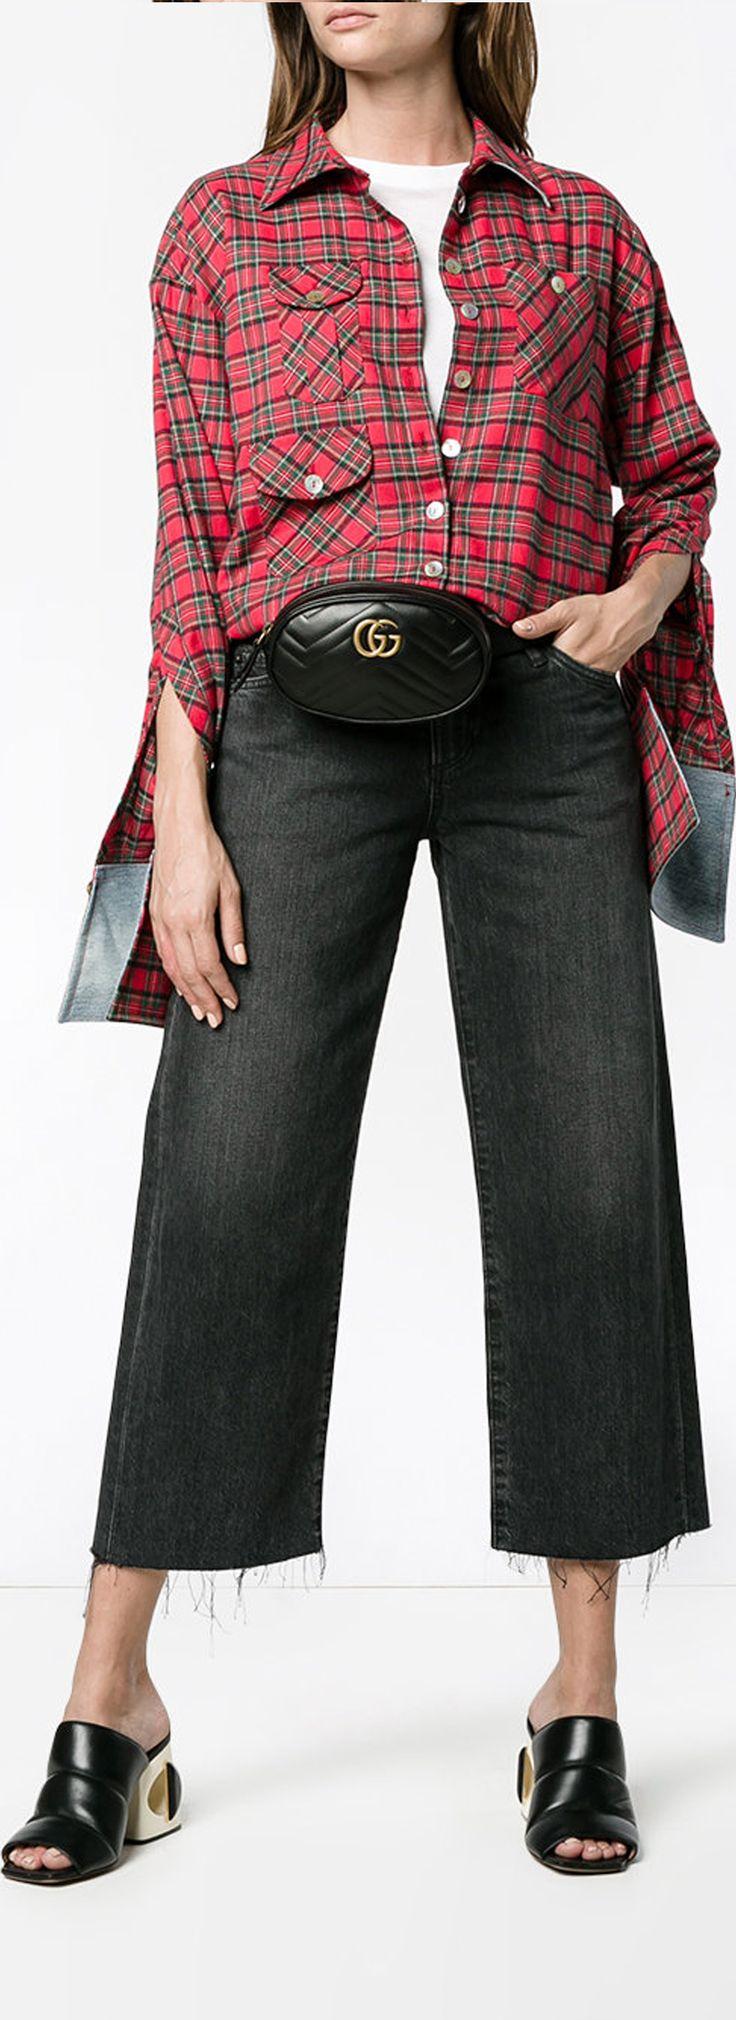 SIMON MILLER  Cropped Jeans with Distressed Hem, explore new season Simon Miller on Farfetch now.